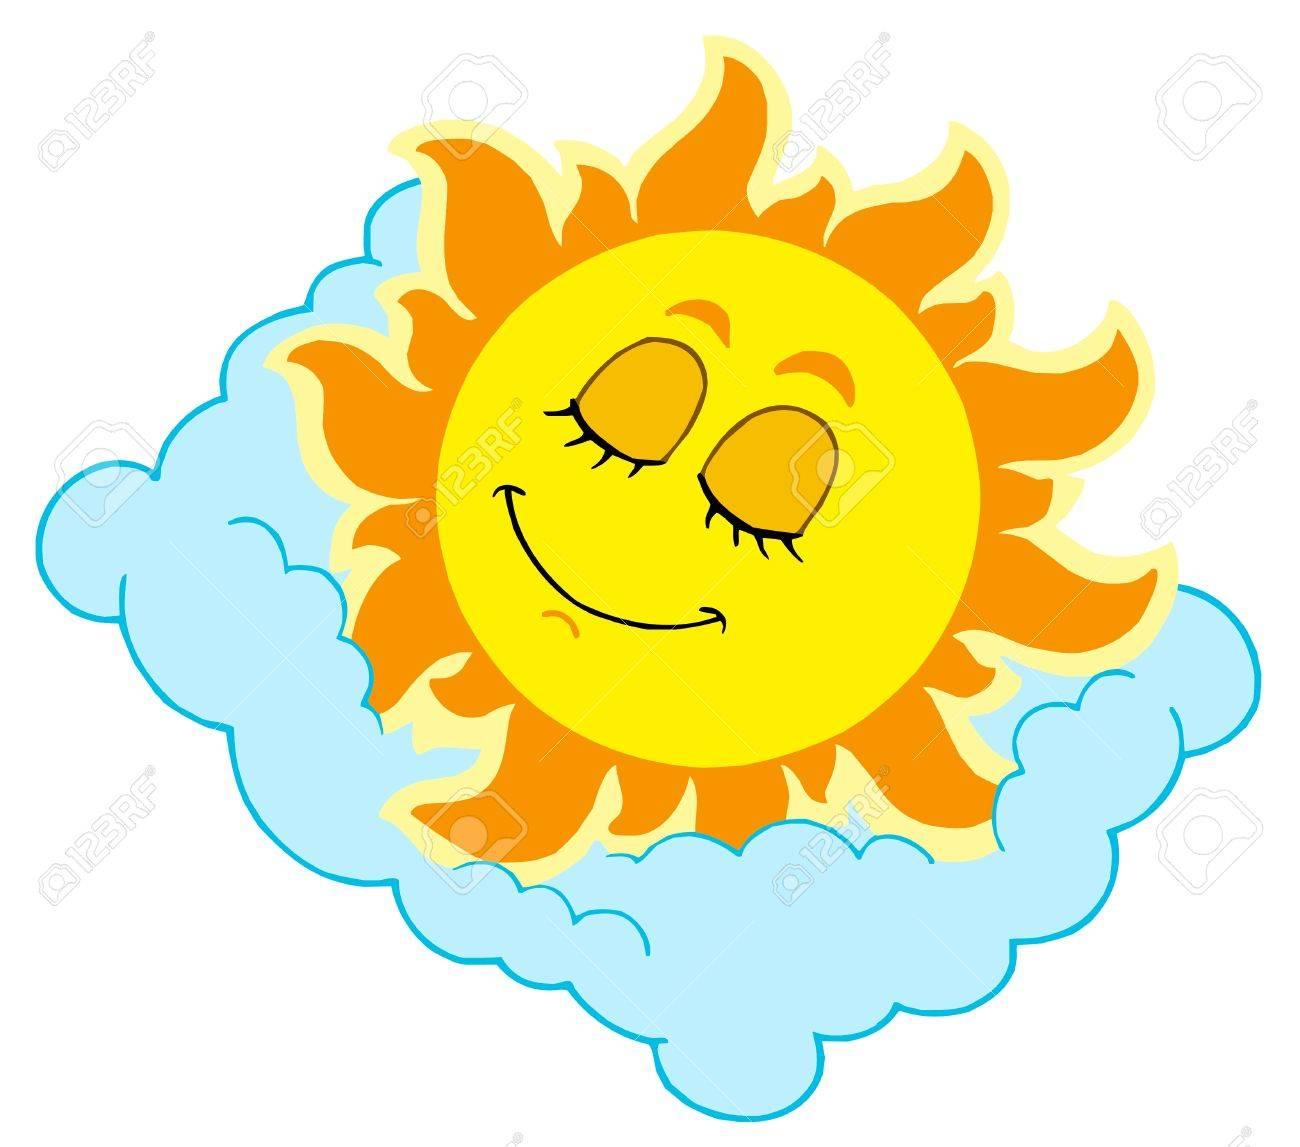 Sleeping Sun on cloudy pillow - vector illustration. Stock Vector - 5151553